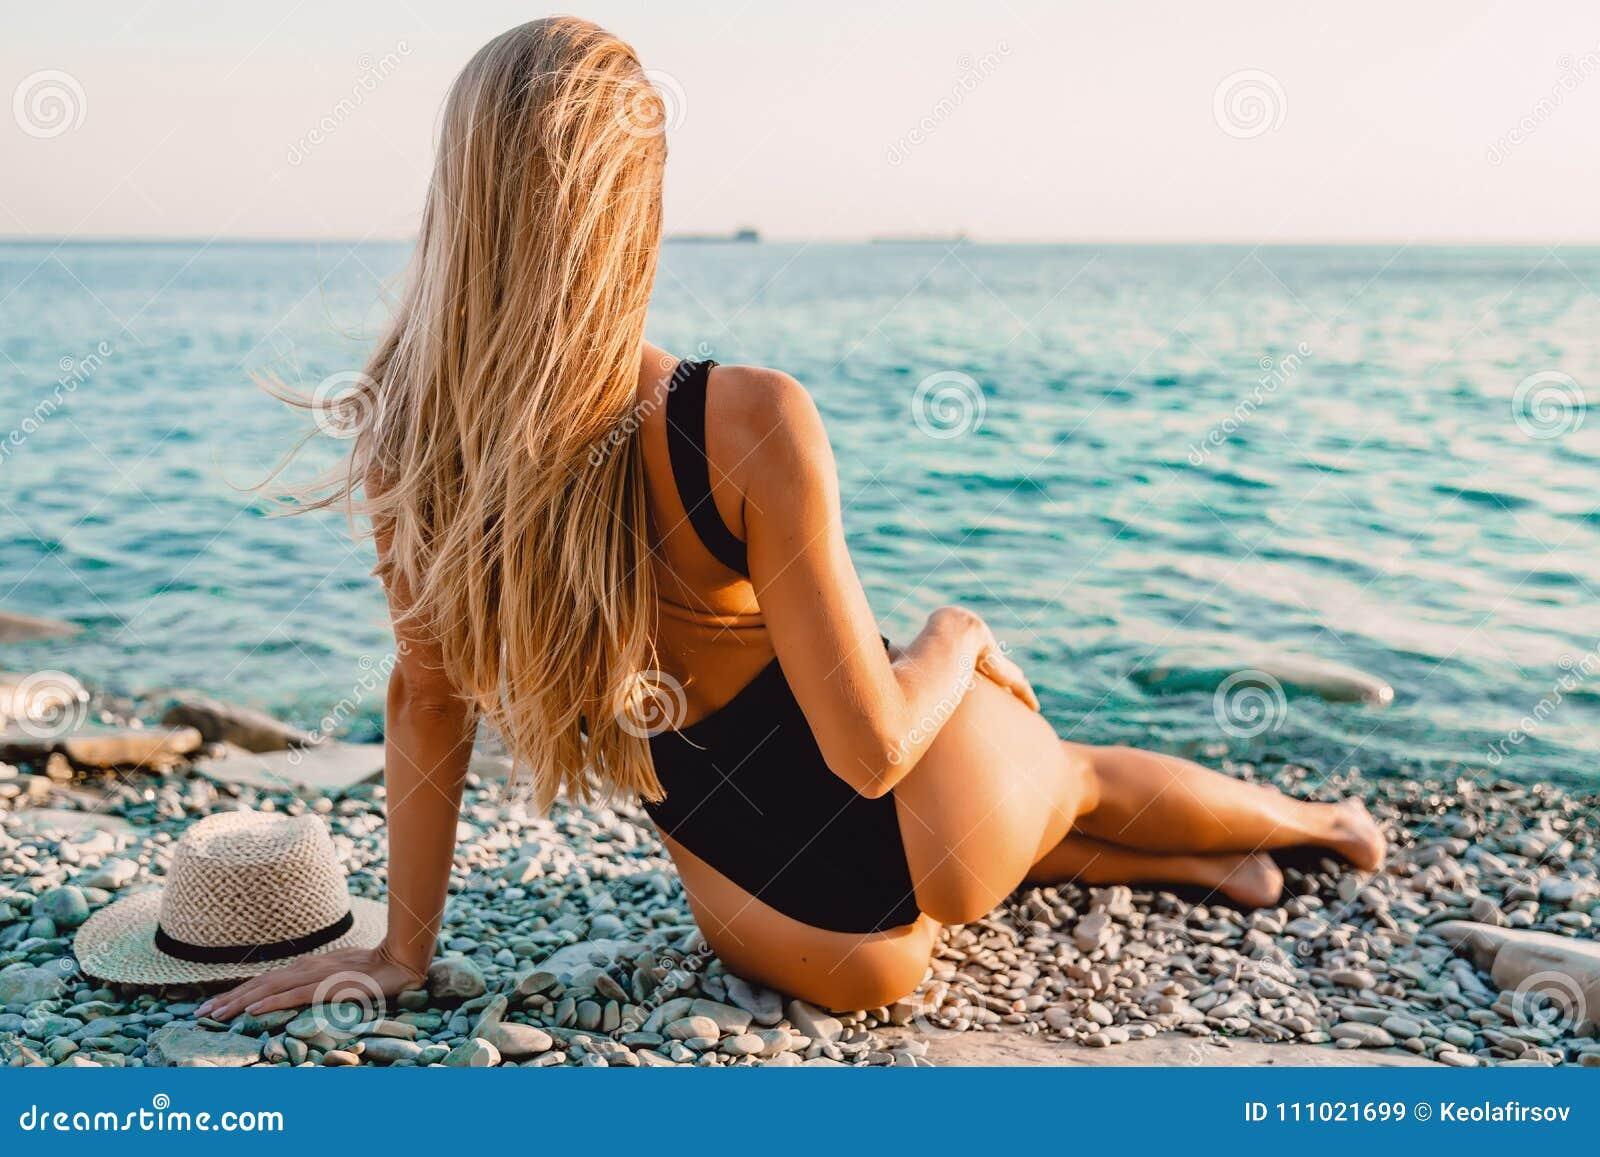 9999515bc06 Ξανθή γυναίκα στη μαύρη Swimwear χαλάρωση στη θάλασσα Στοκ Εικόνα ...